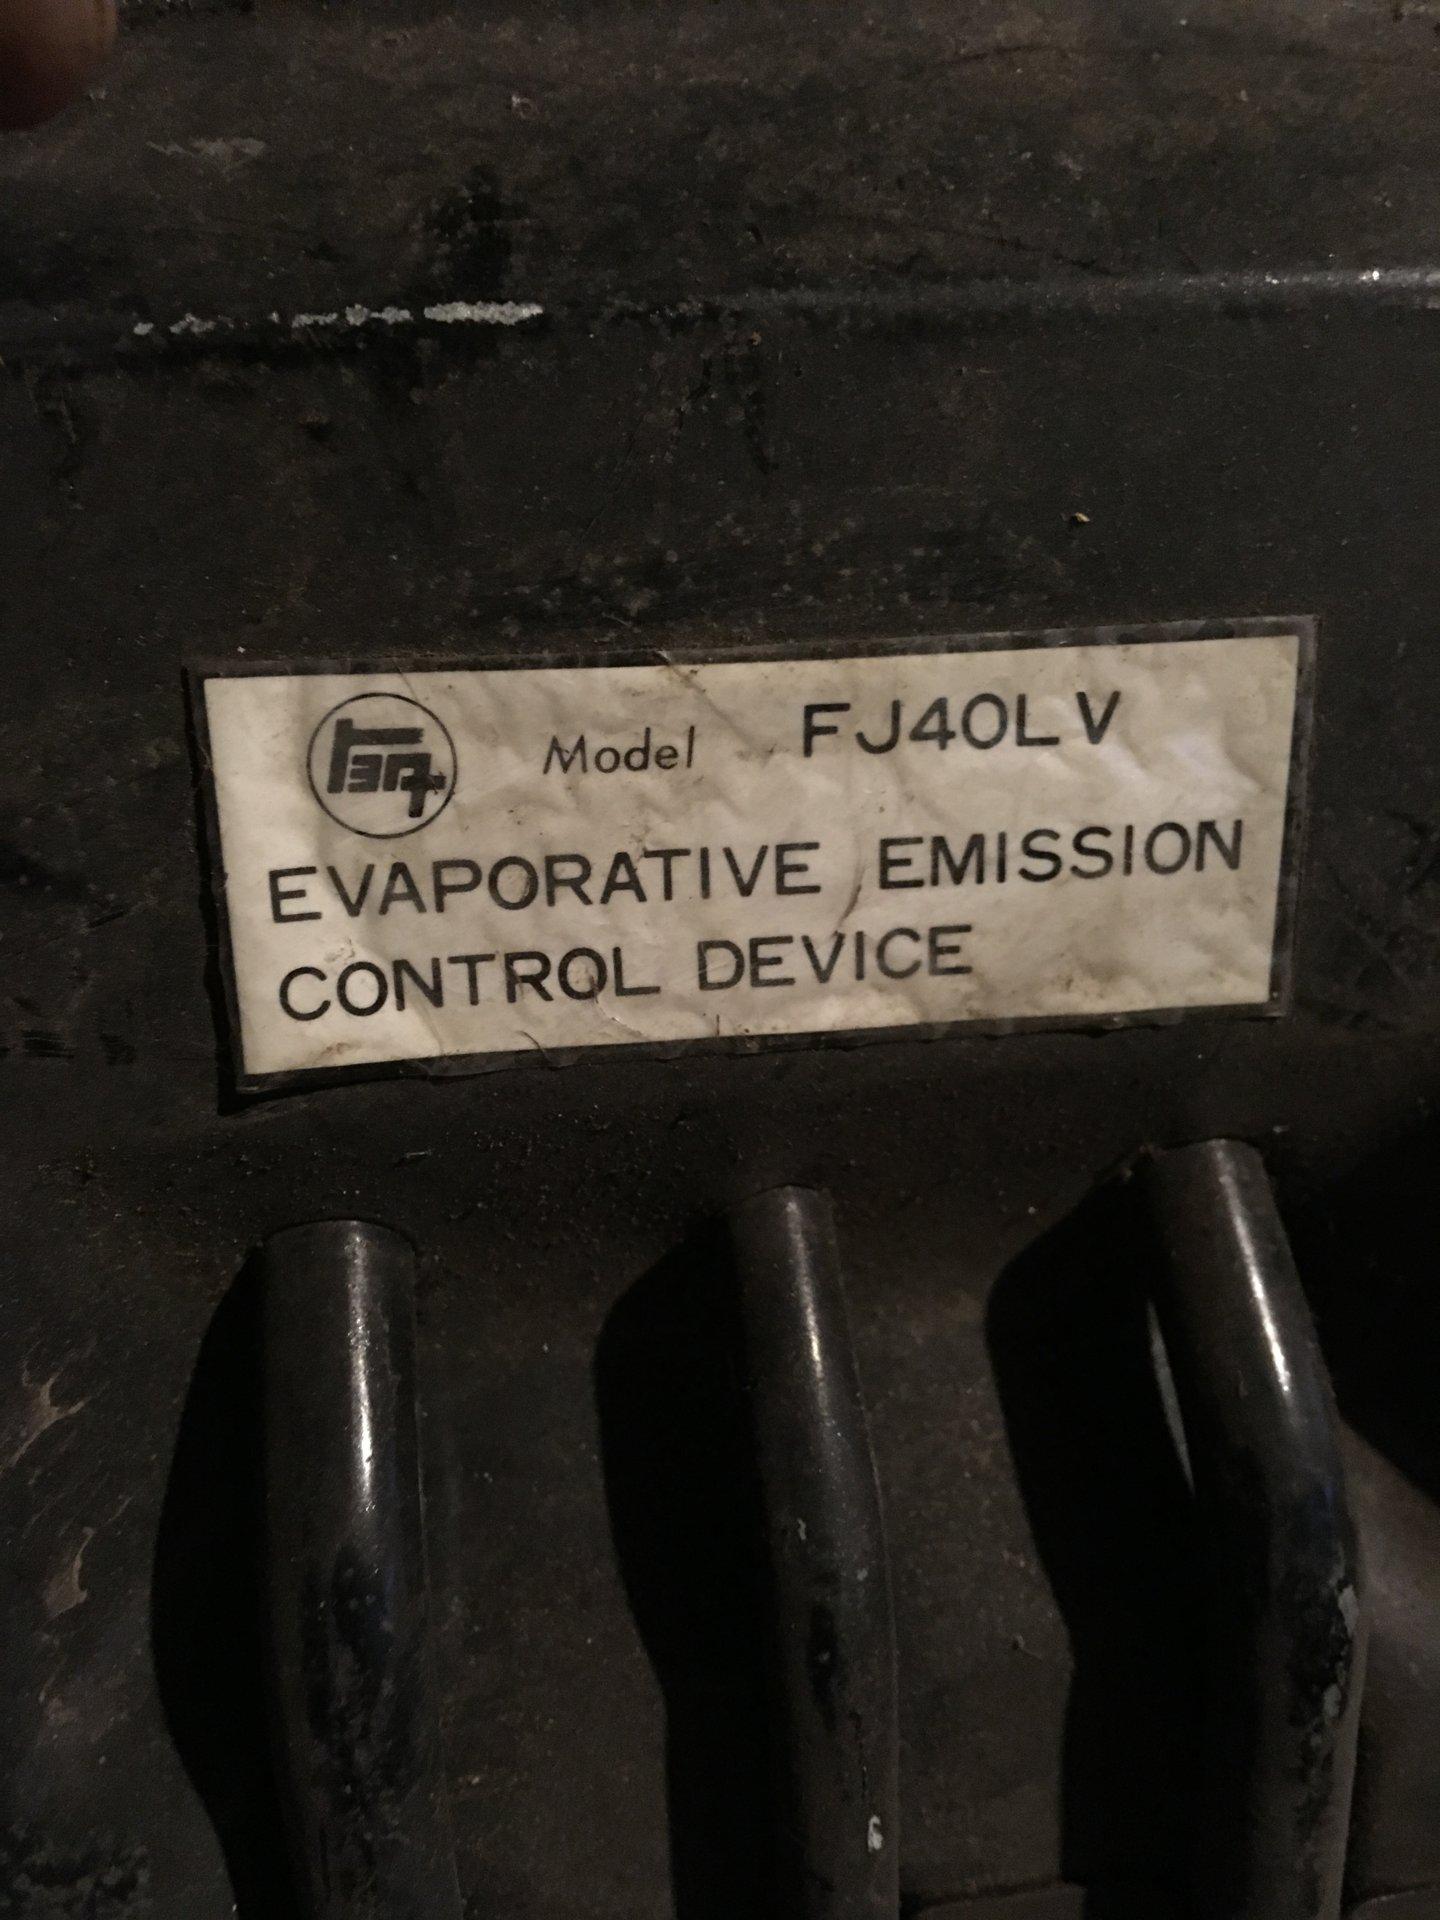 51DC2A71-D557-426D-9D8F-5D305FF02E4D.jpeg